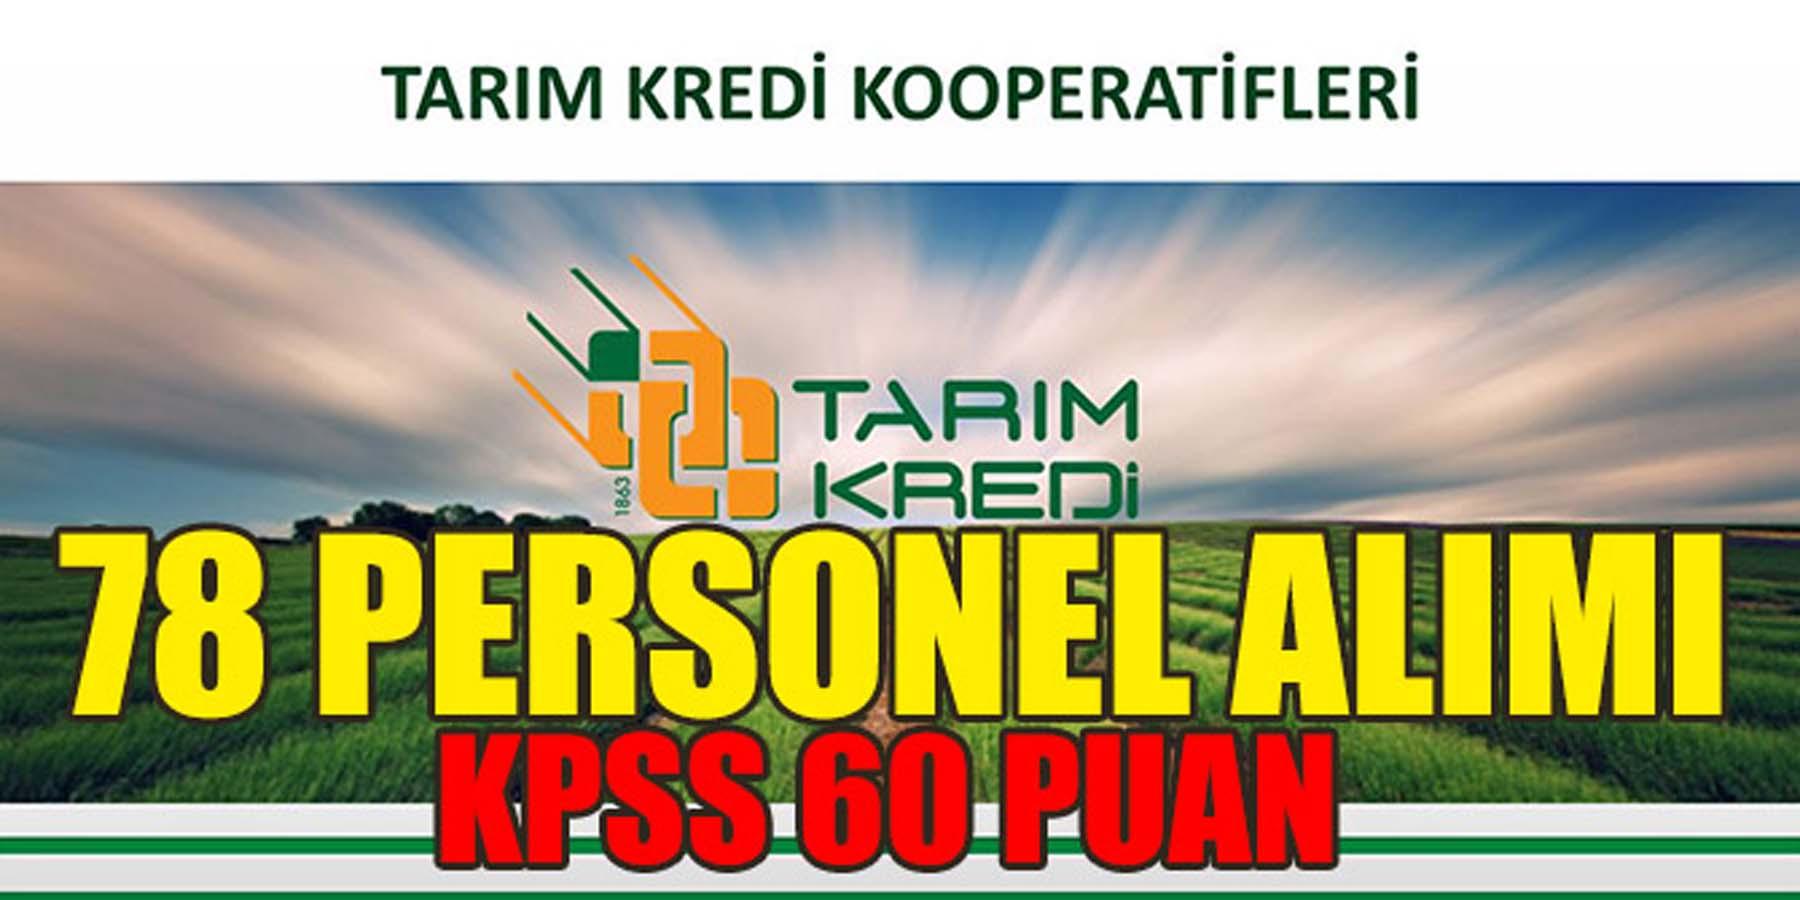 Tarım Kredi Kooperatifleri KPSS 60 Puanla 78 Personel Alımı